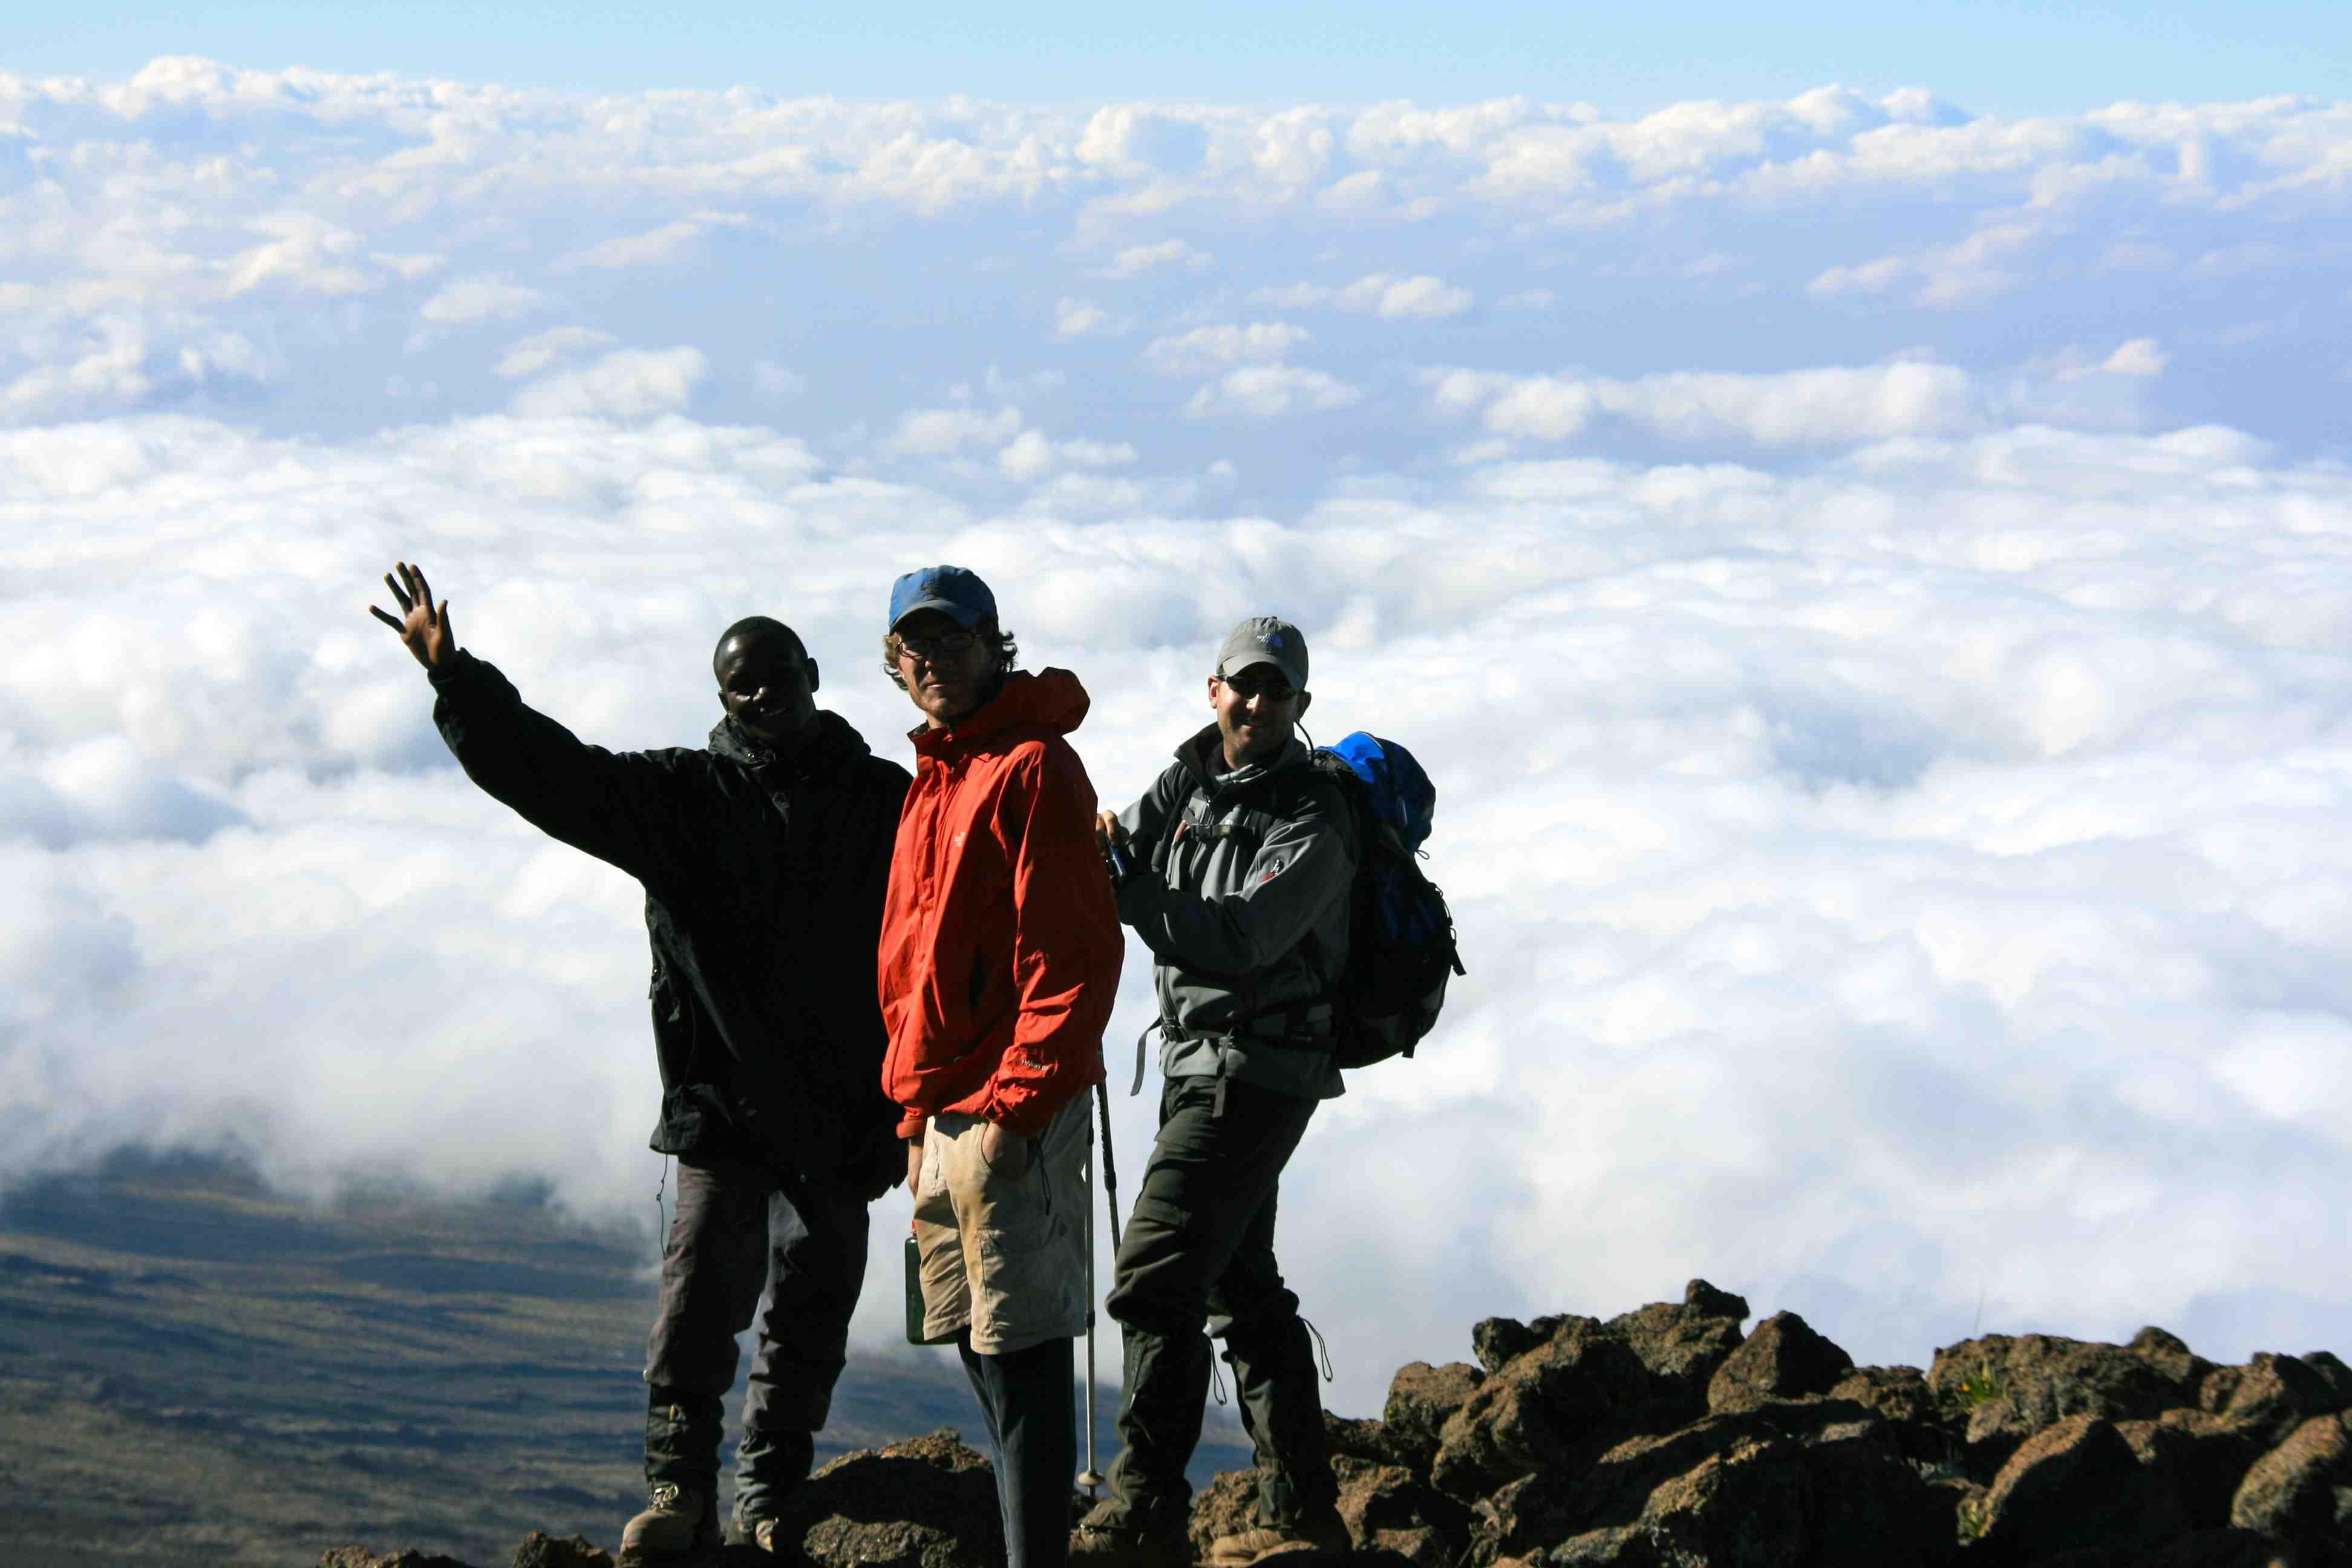 Kilimanjaro Climbing Deaths Hiking Above Clouds